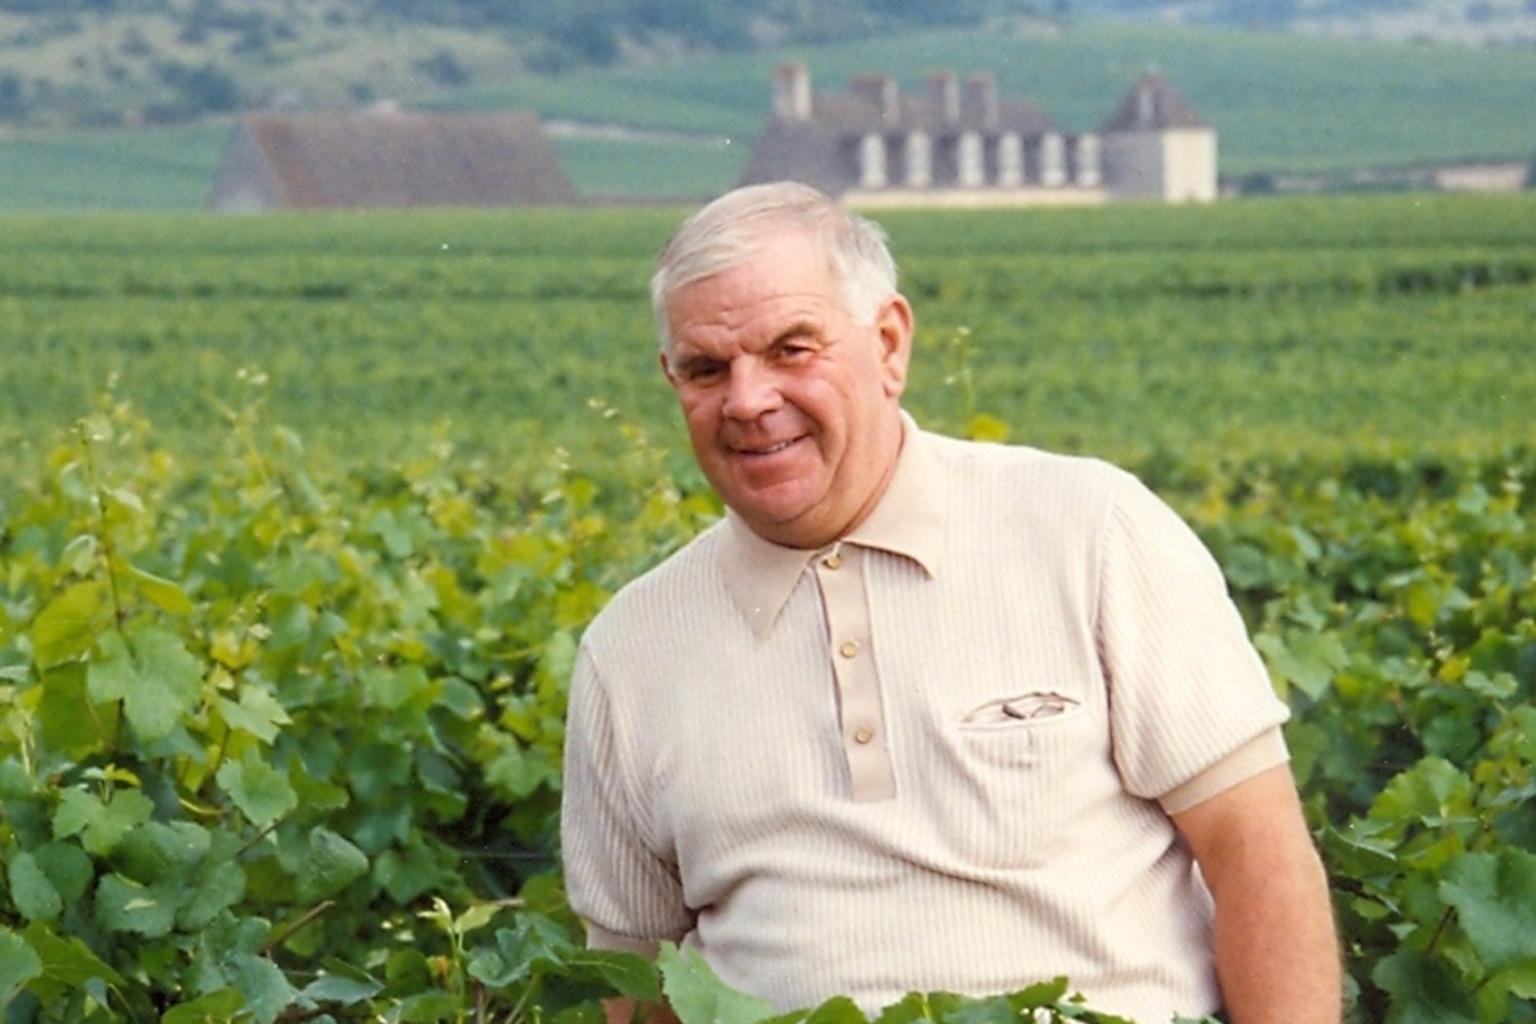 Domaine Mongeard-Mugneret - アペロ ワインバー オーガニックワインxフランス家庭料理 - 東京都港区南青山3-4-6 / apéro WINEBAR - vins et petits plats français